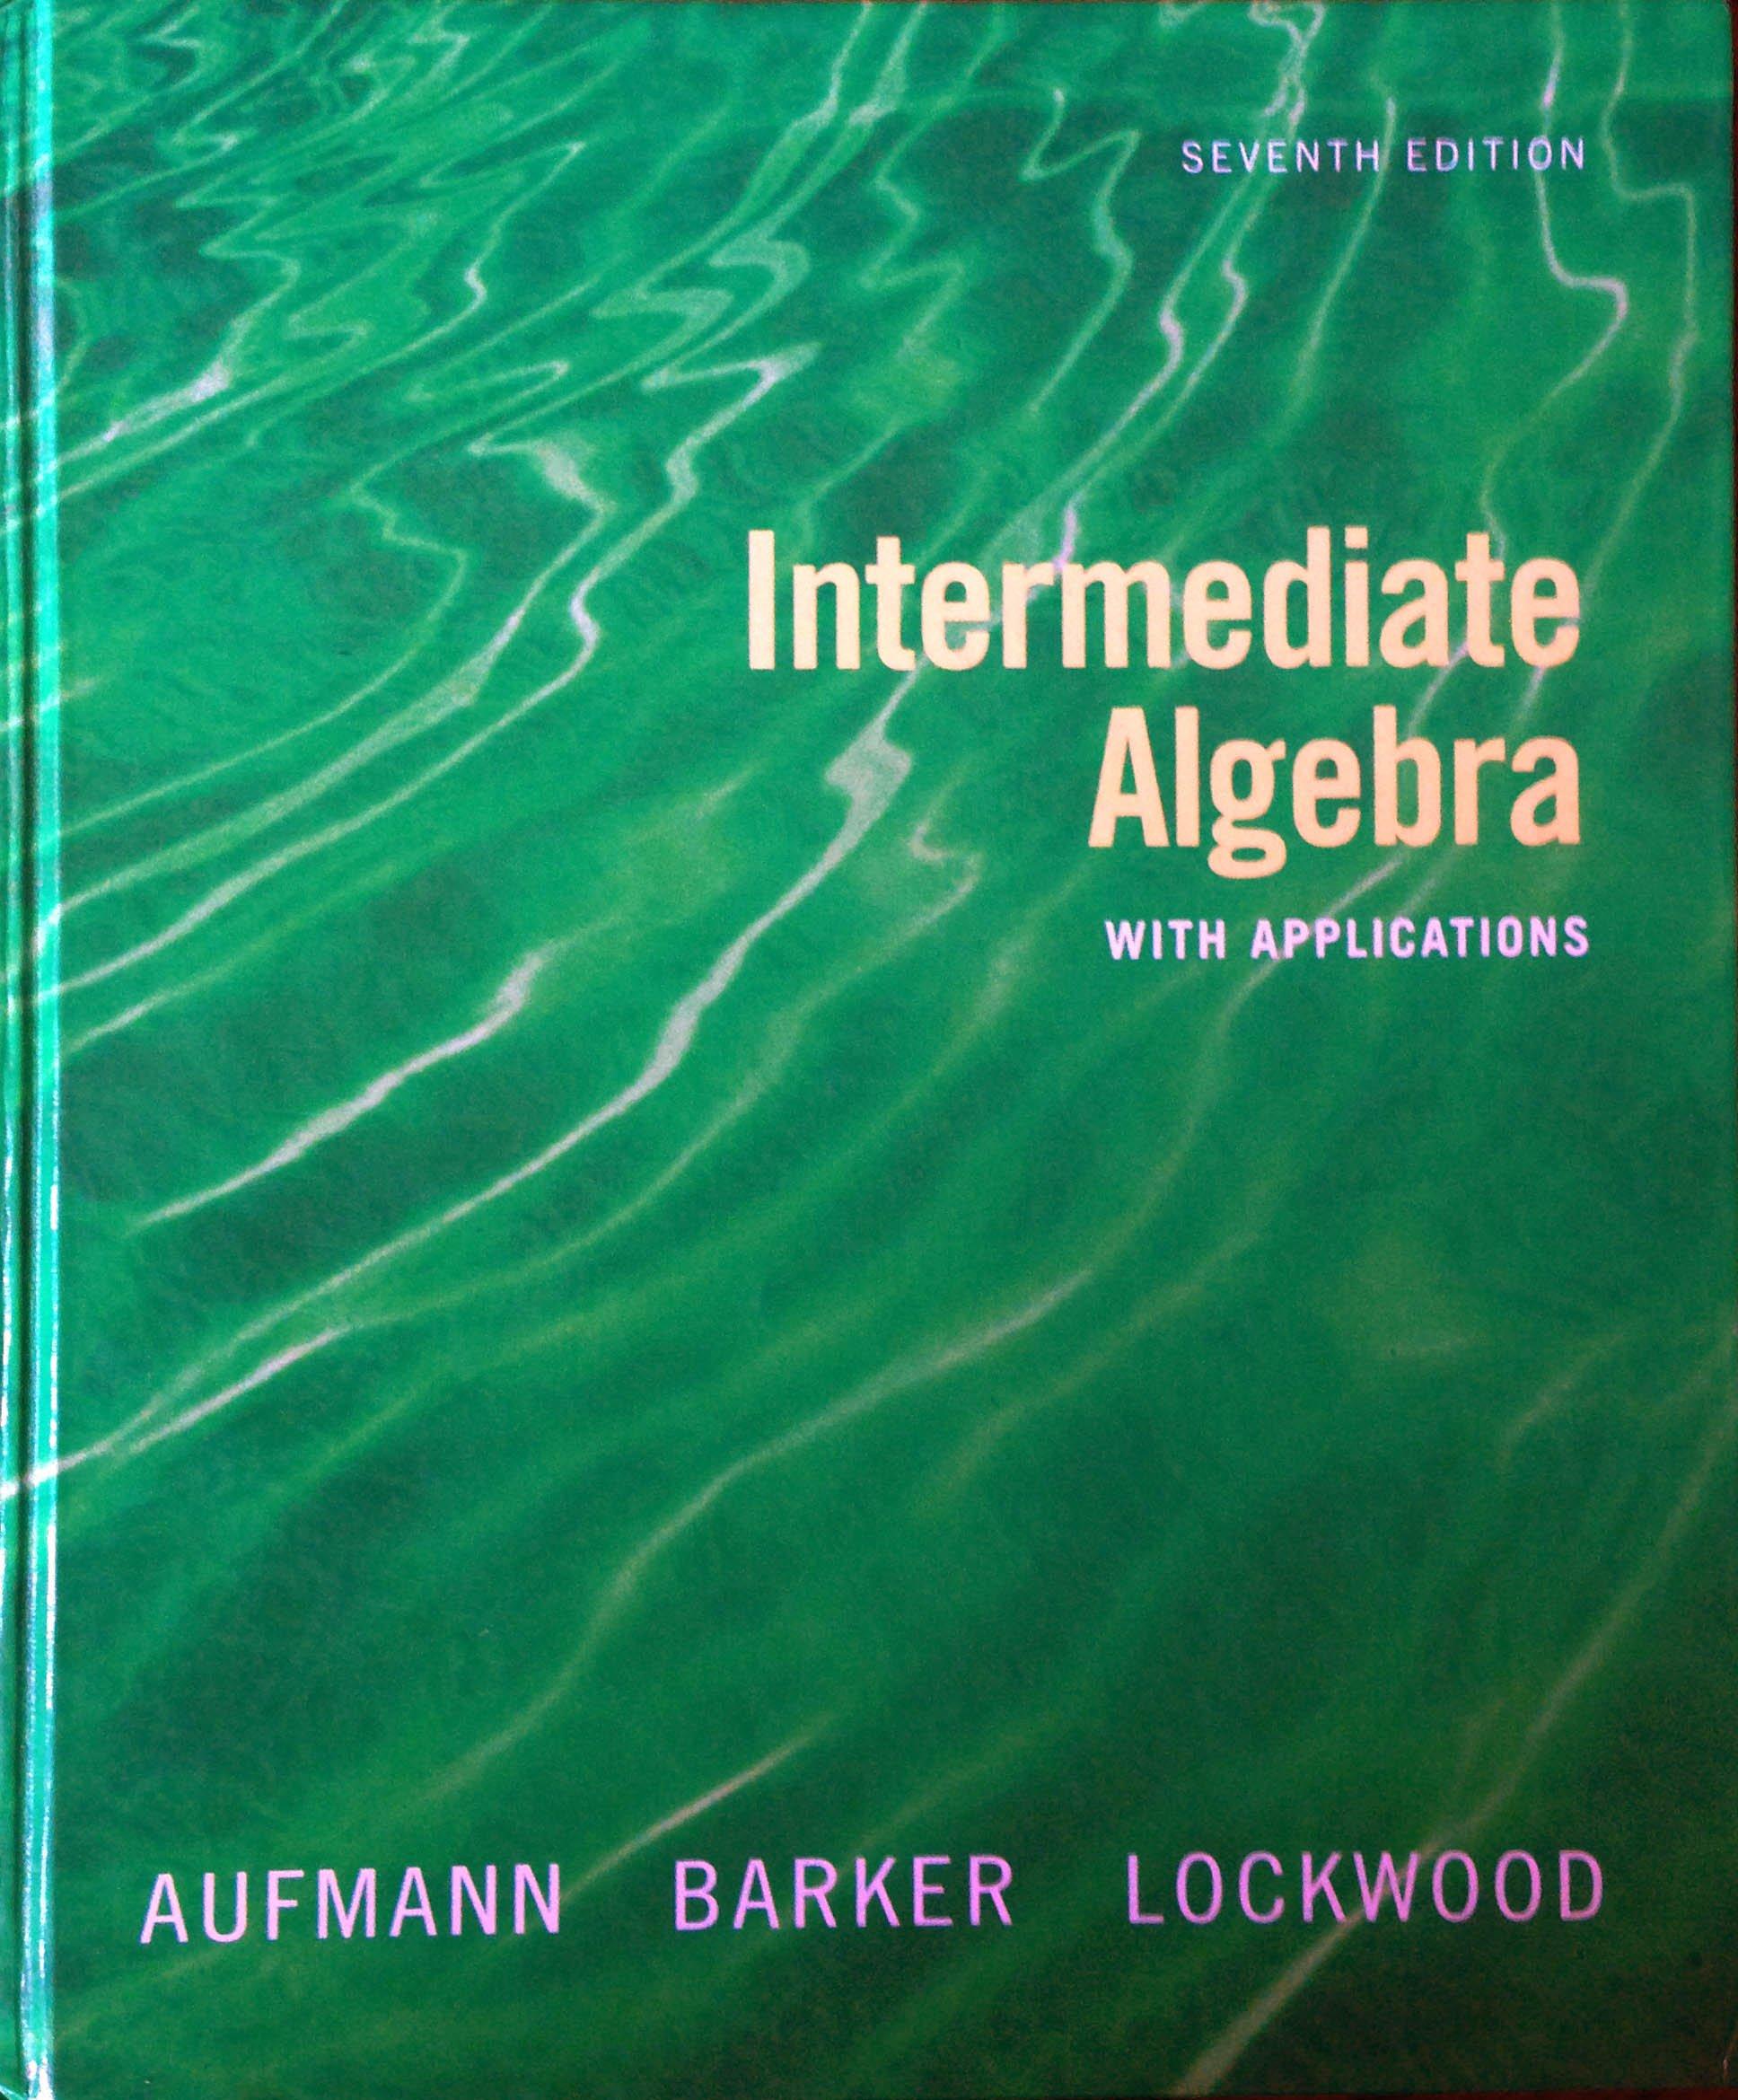 Intermediate Algebra With Applications 7th edition pdf